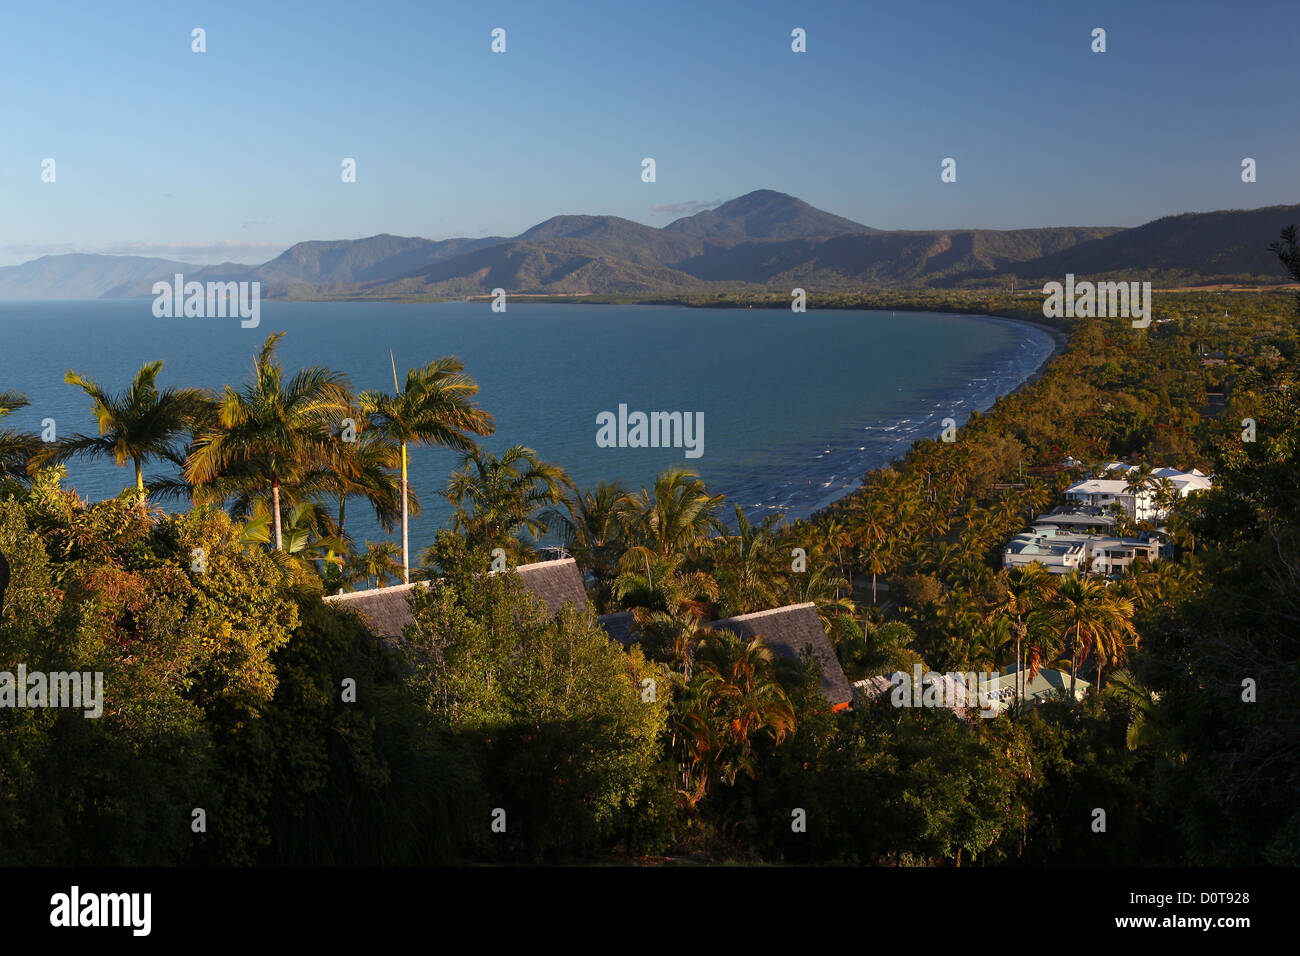 Flagstaff Hill, hill, view, port Douglas, Queensland, Australia, palms, sun, blue sky, sea, afternoon, Four Mile - Stock Image